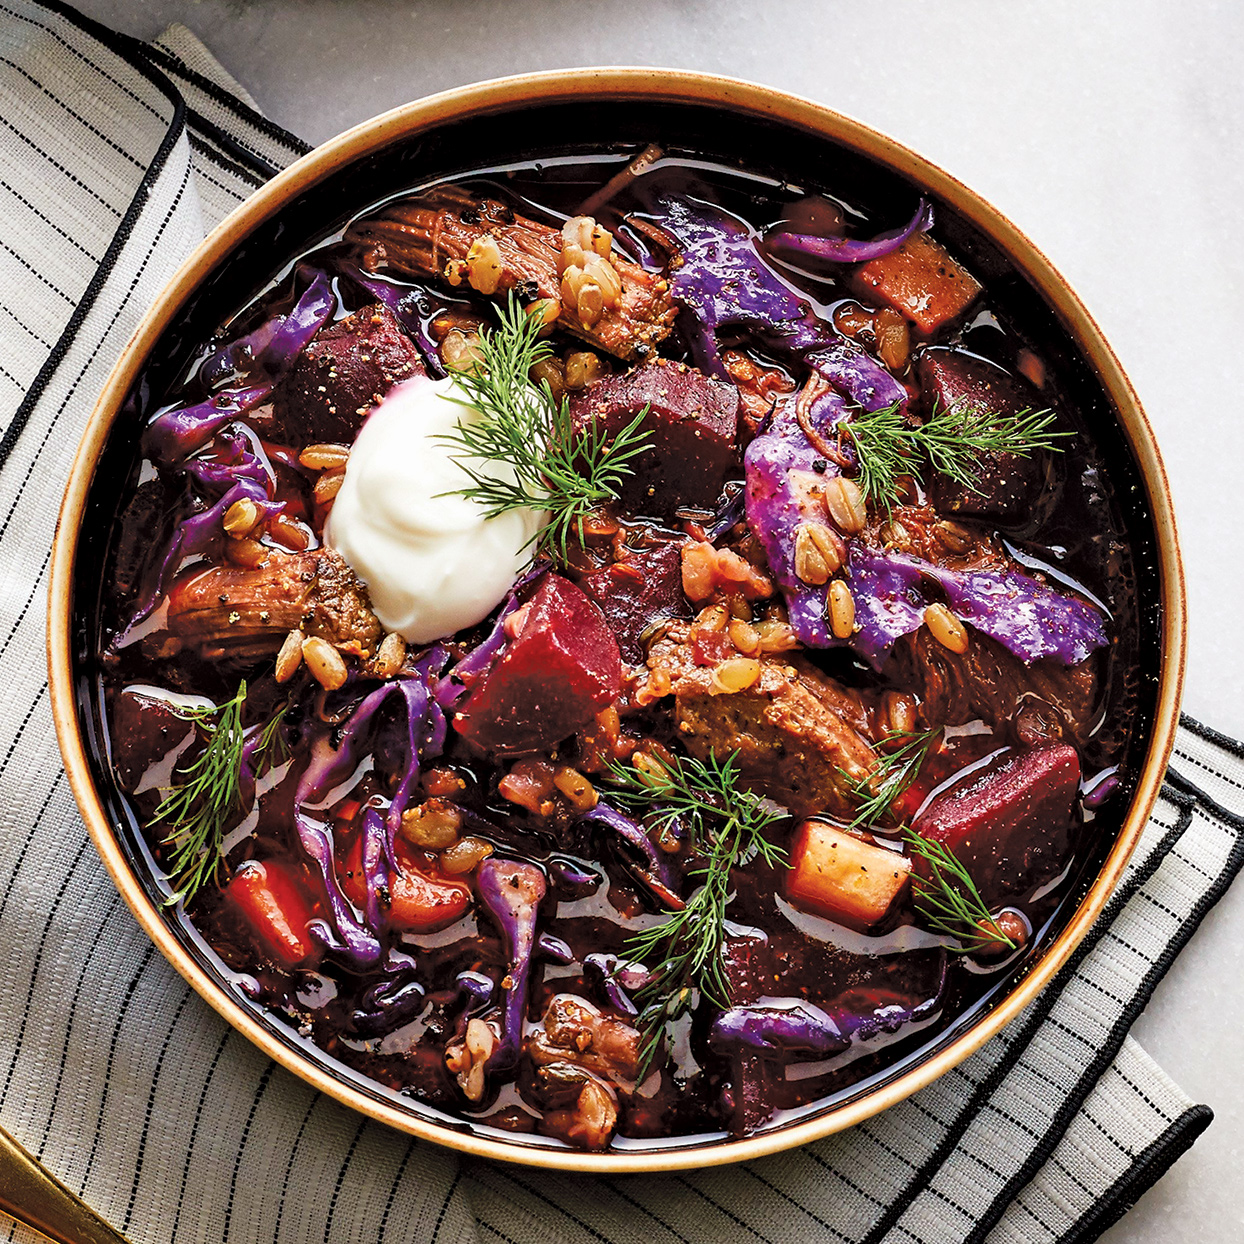 Healthy Slow-Cooker & Crock Pot Vegetable Soups